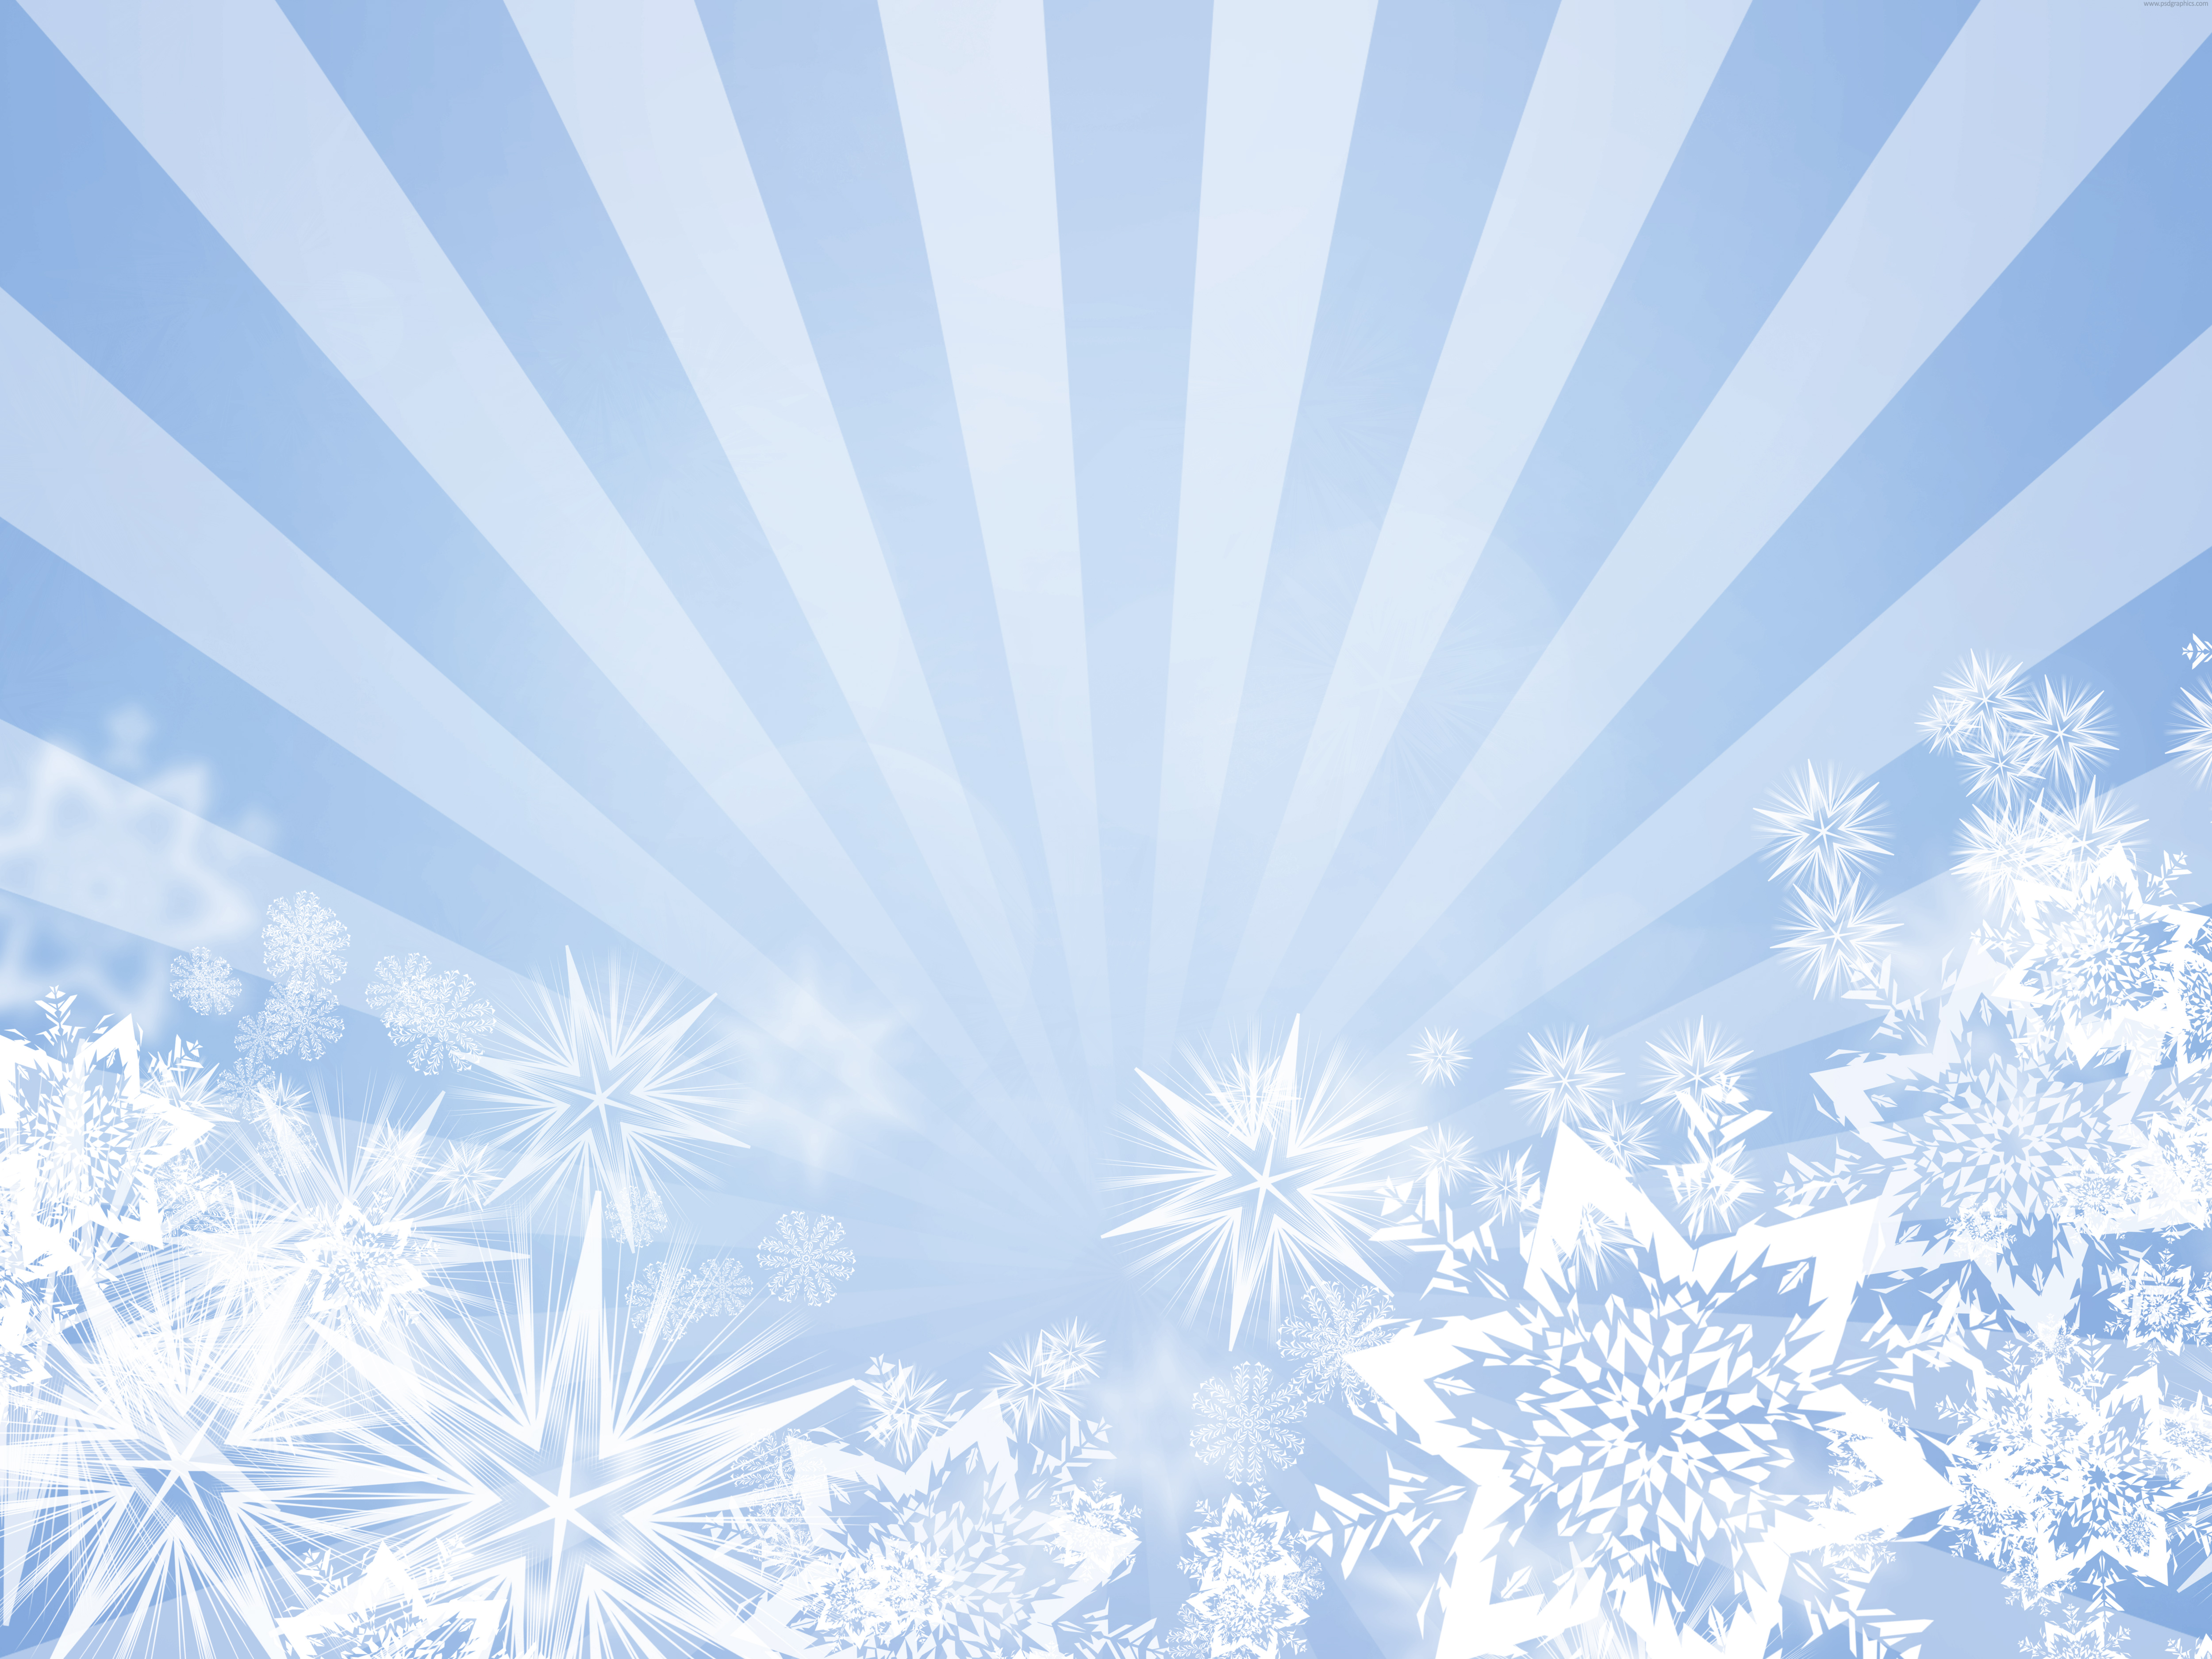 Light Blue Snowflakes Design Psdgraphics